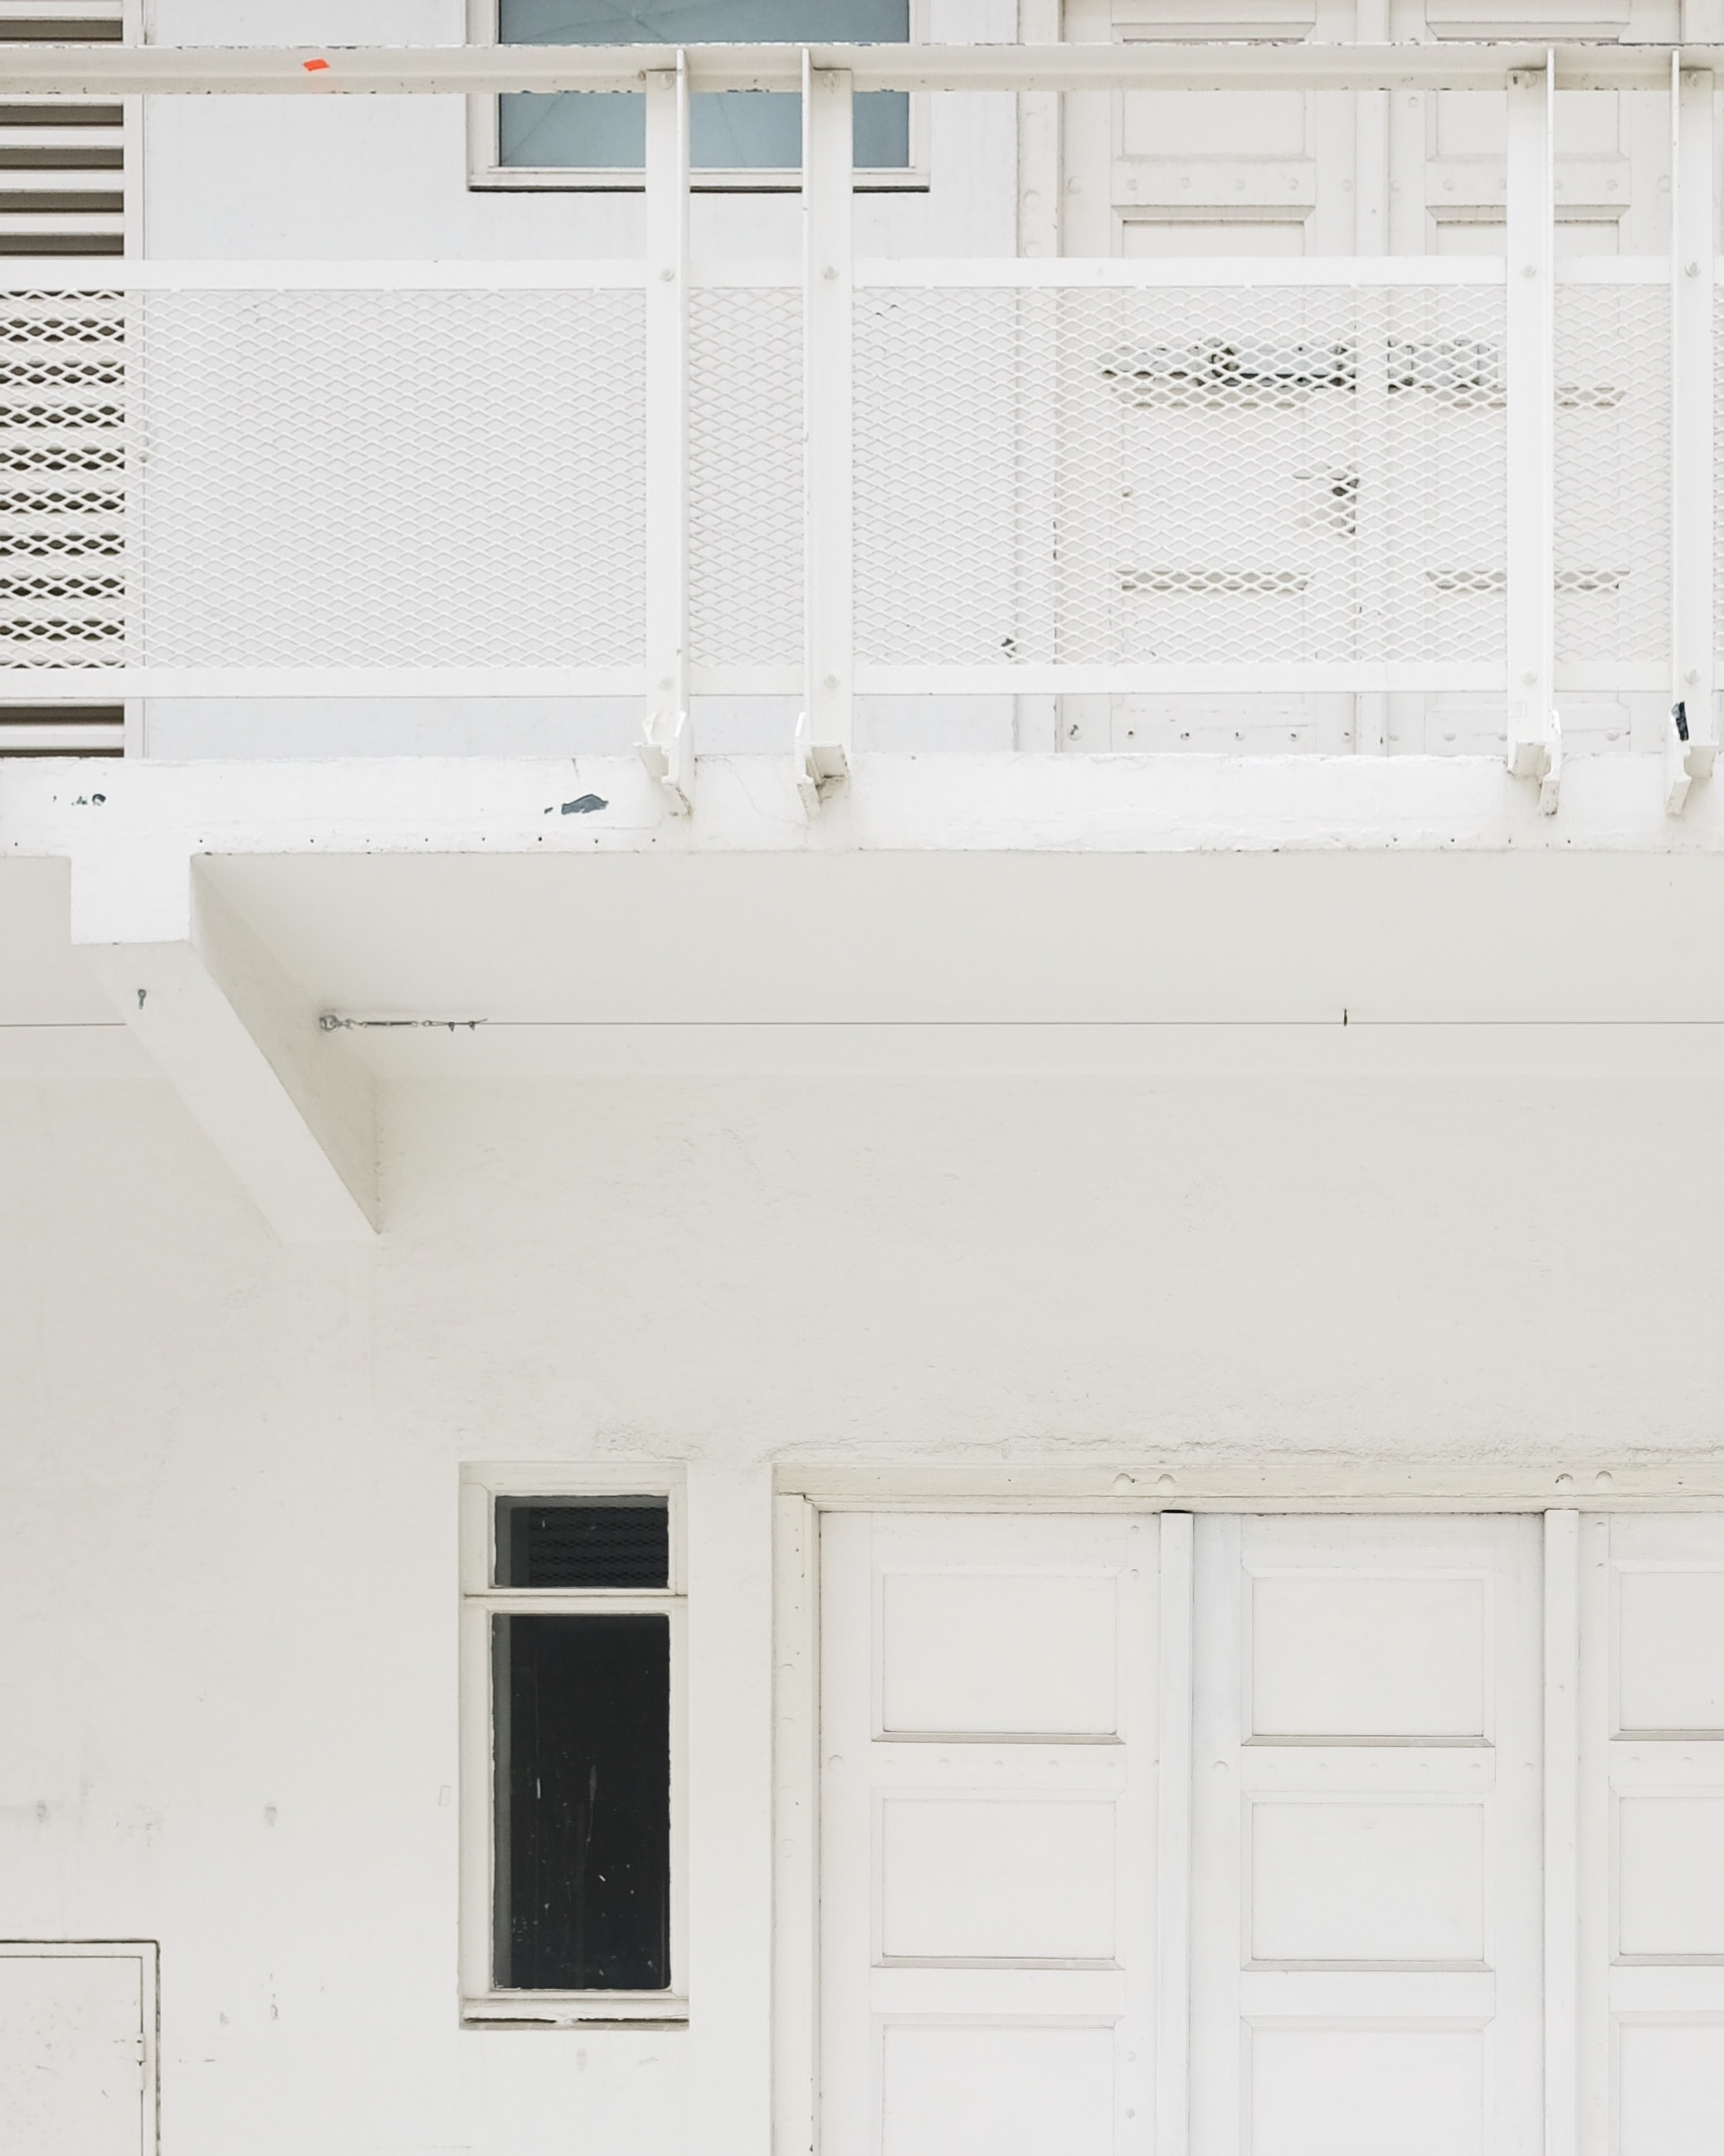 terrace near white door